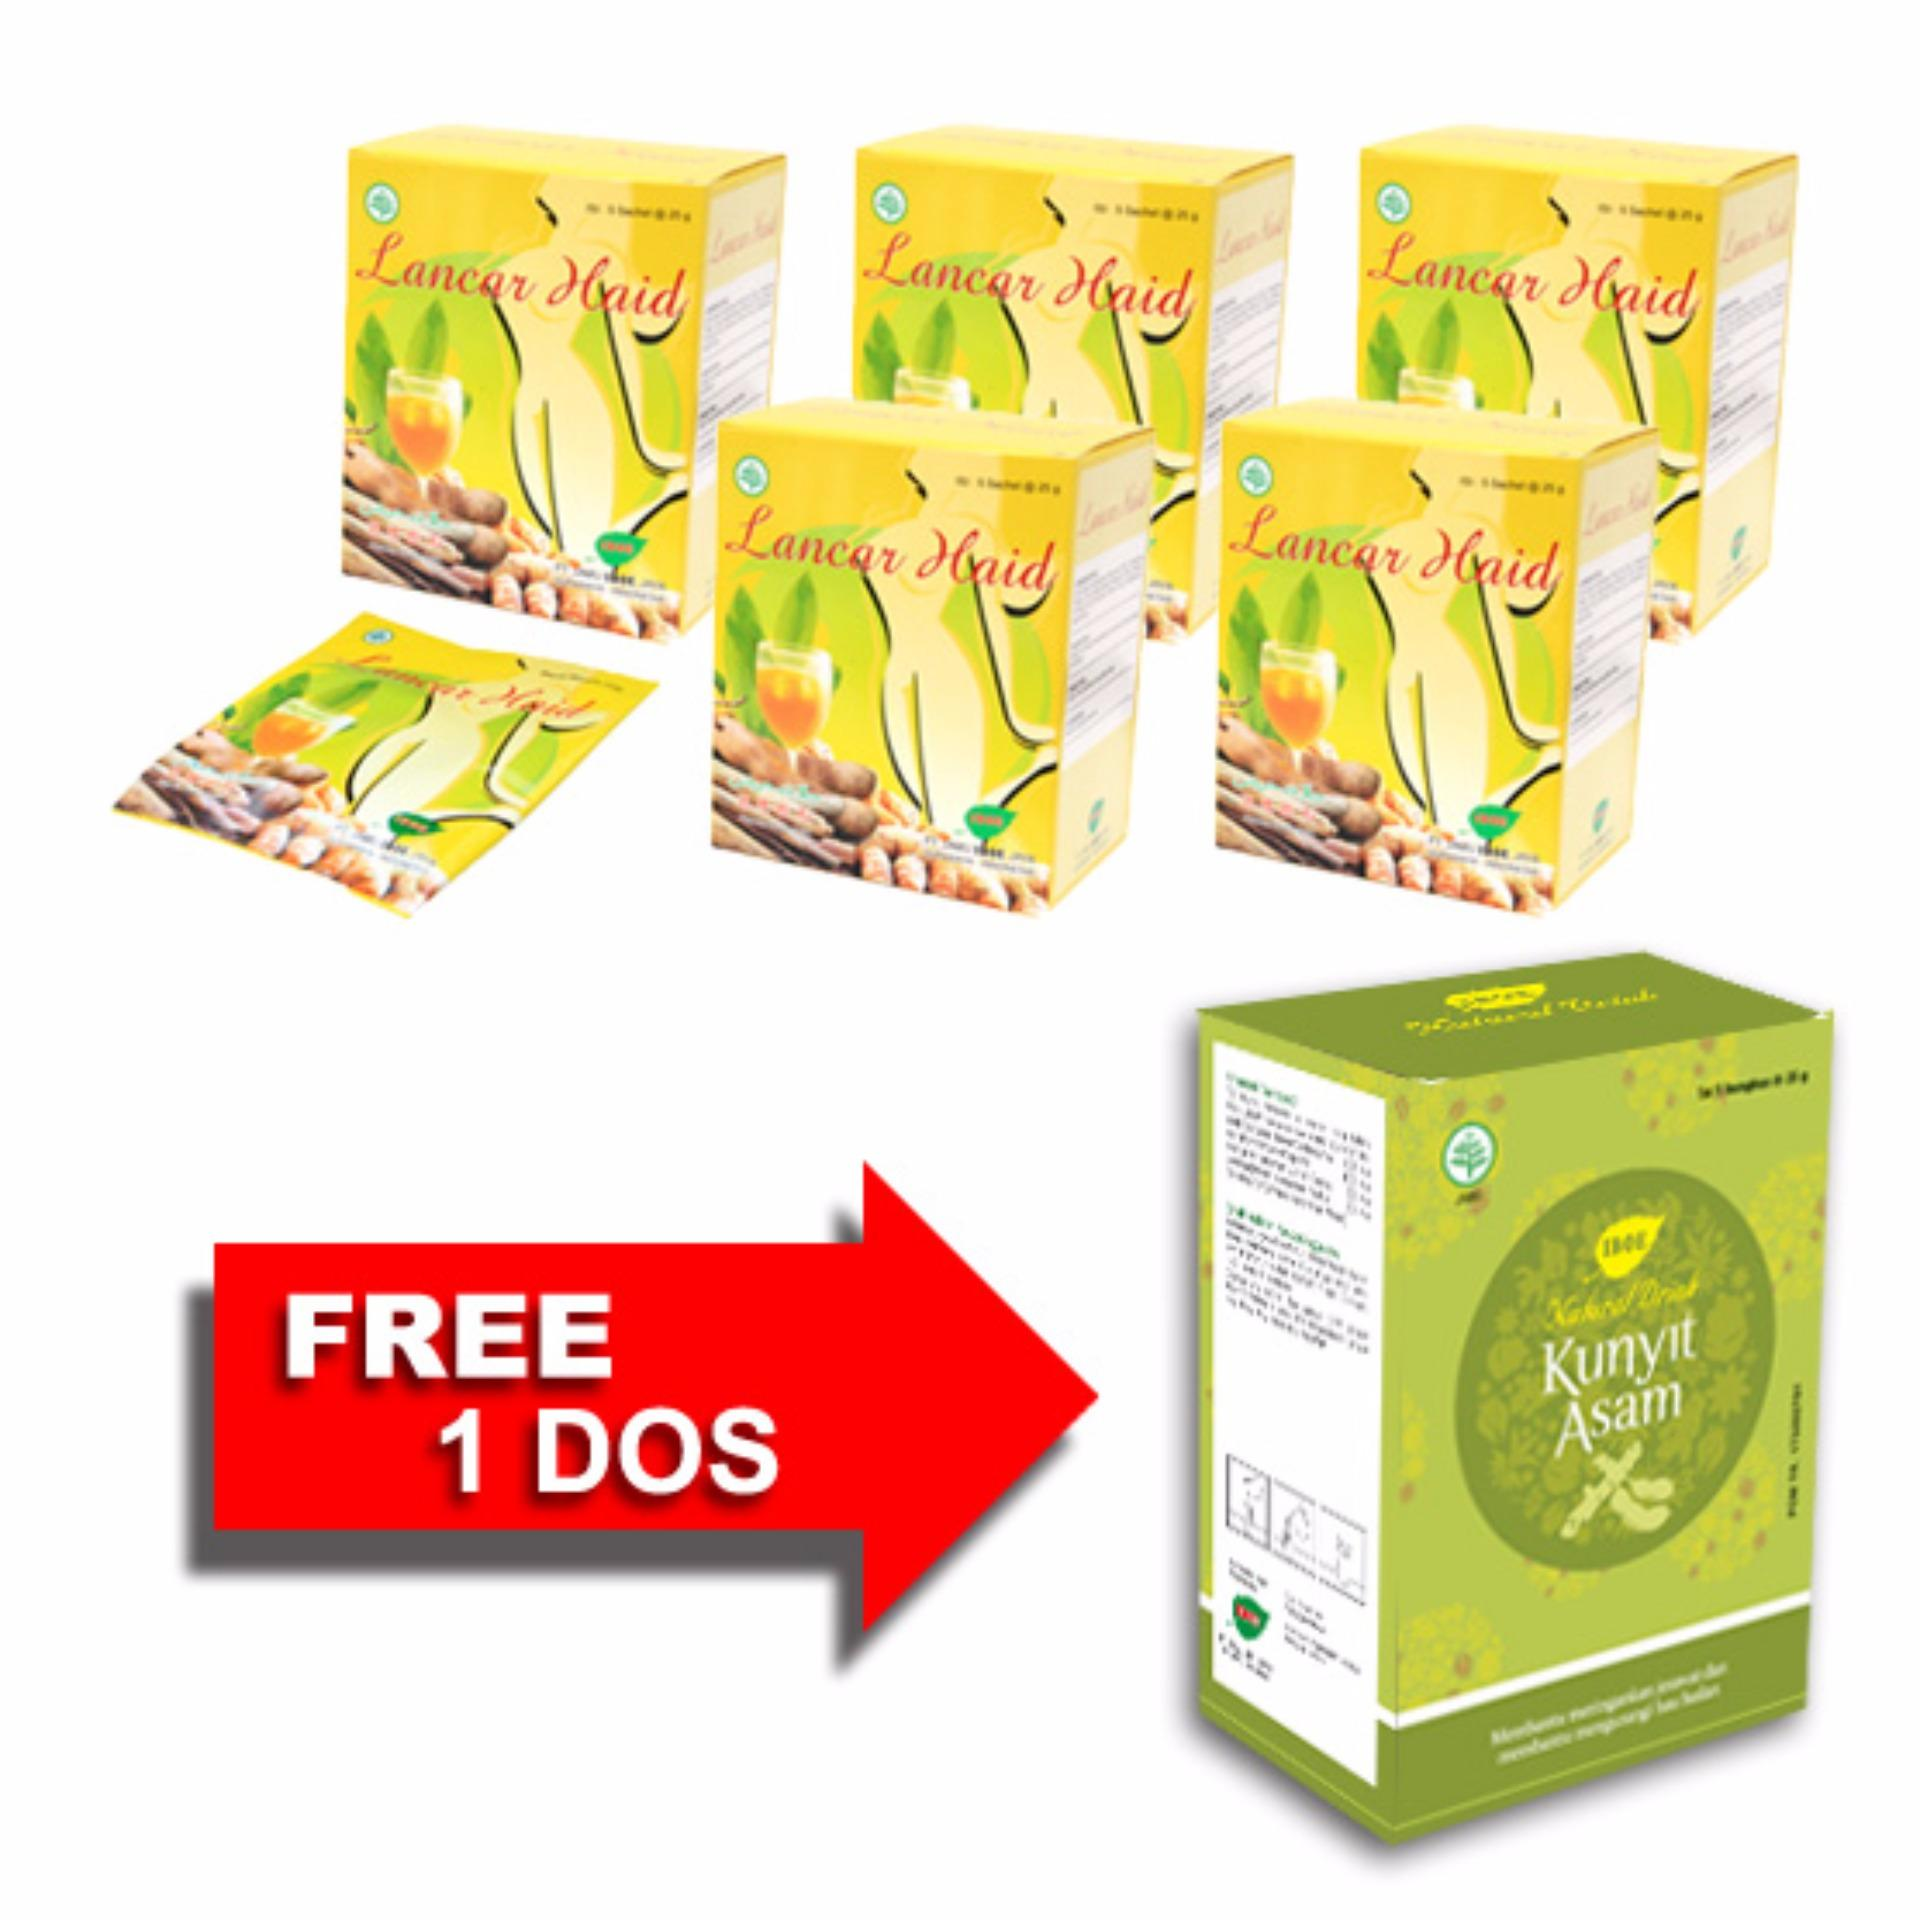 Jamu Iboe Promo Minyak Telon 5 Botol 60 Ml Daftar Harga Terbaru Morinaga Chil Go Vanilla 6x140  Free 2 Lancar Haid Dos Sachet